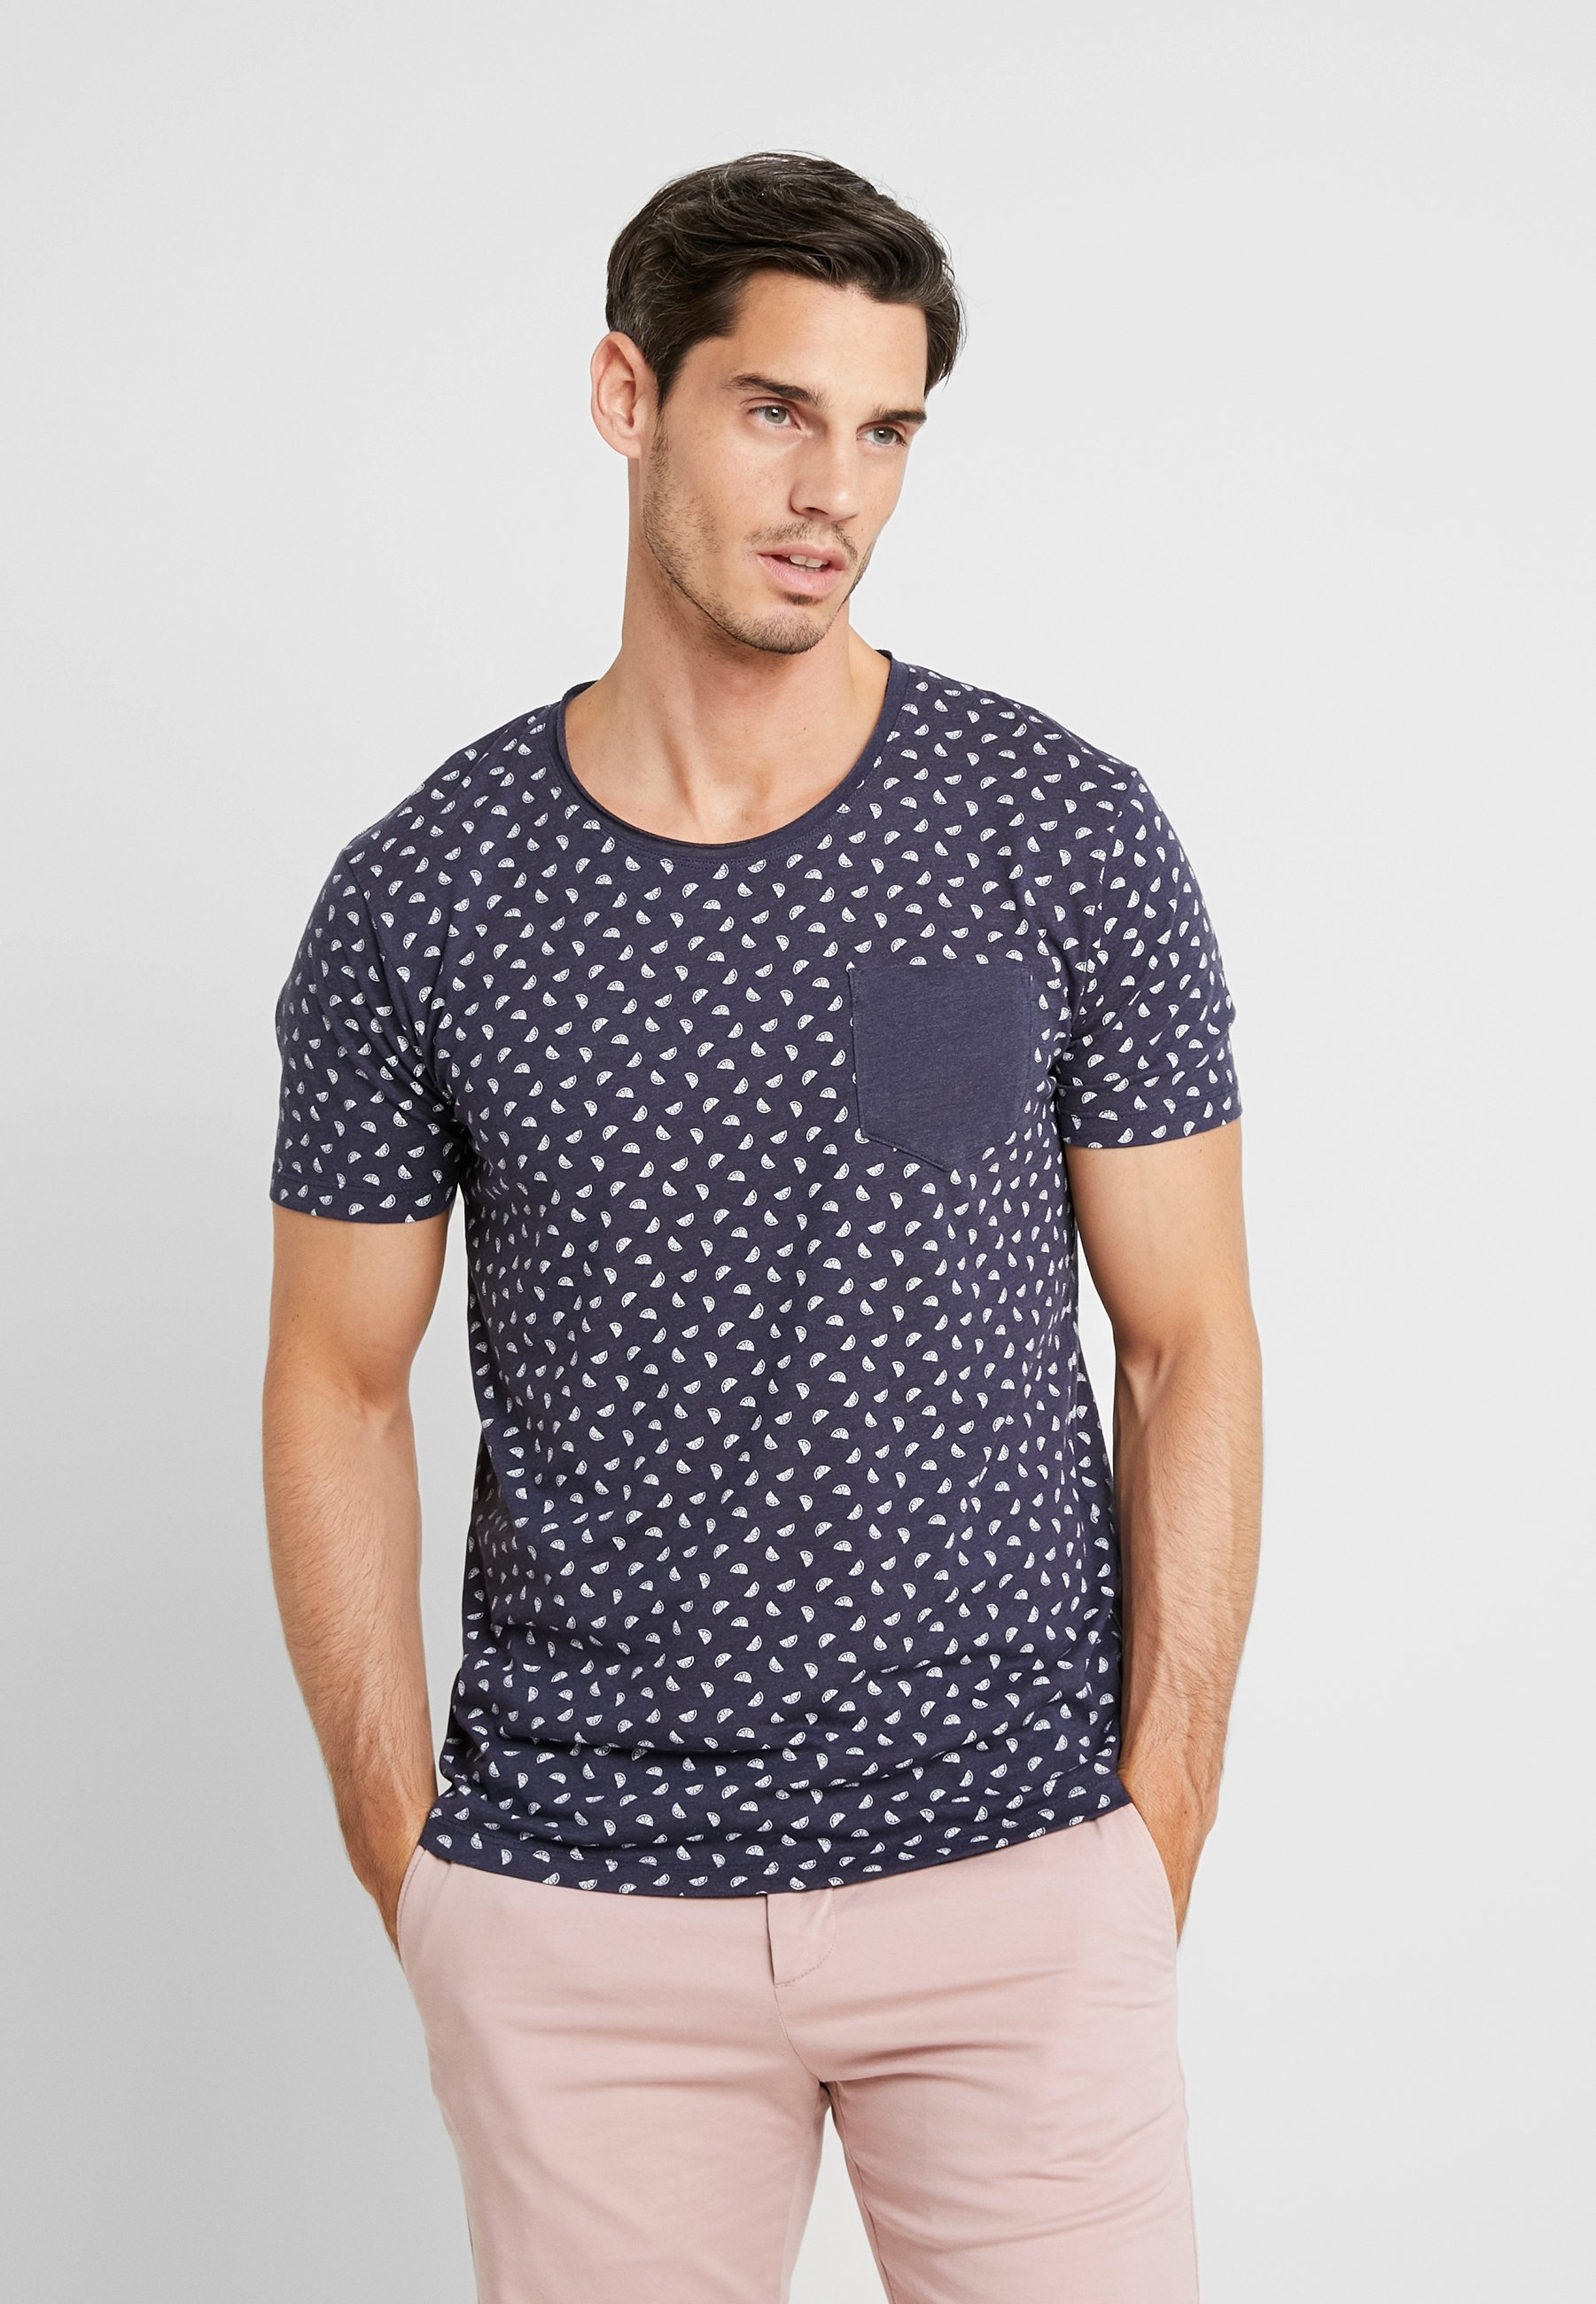 Navy By shirt Edc Aop Eos TeeT Imprimé Esprit iOkZuTPX